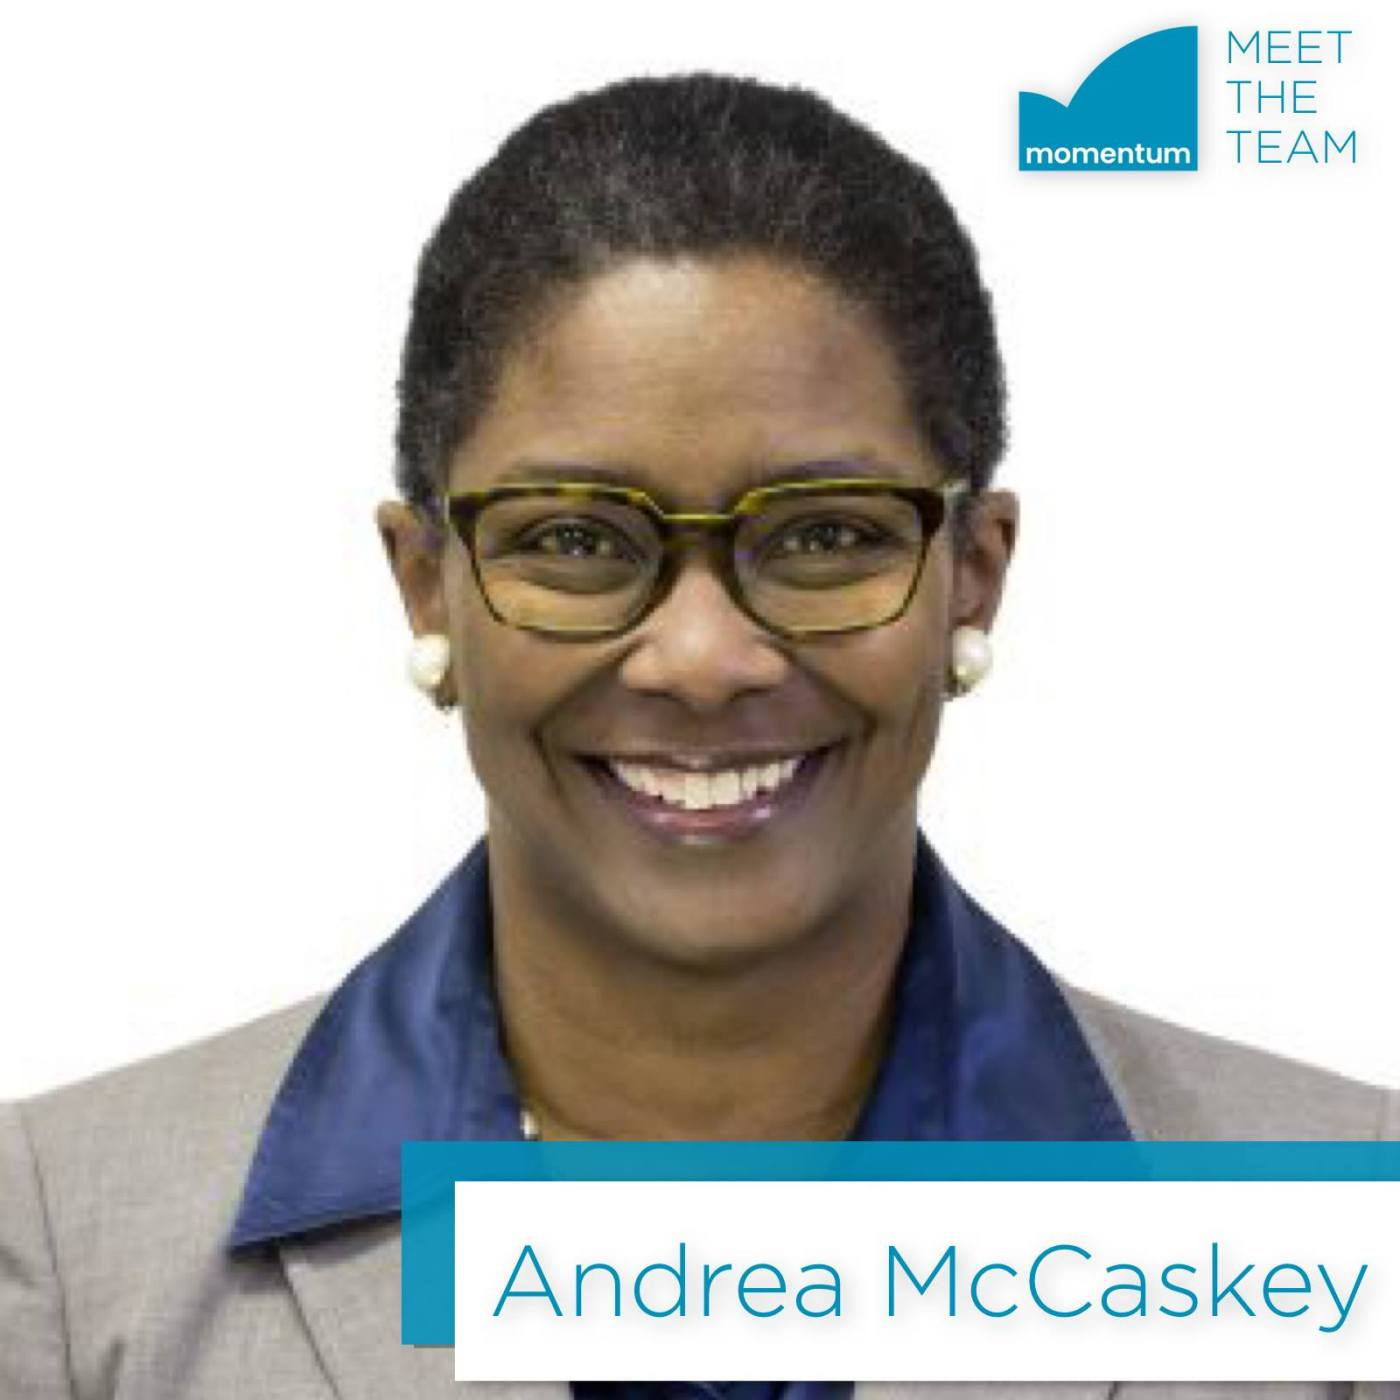 Andrea McCaskey is Momentum's Director of Programs